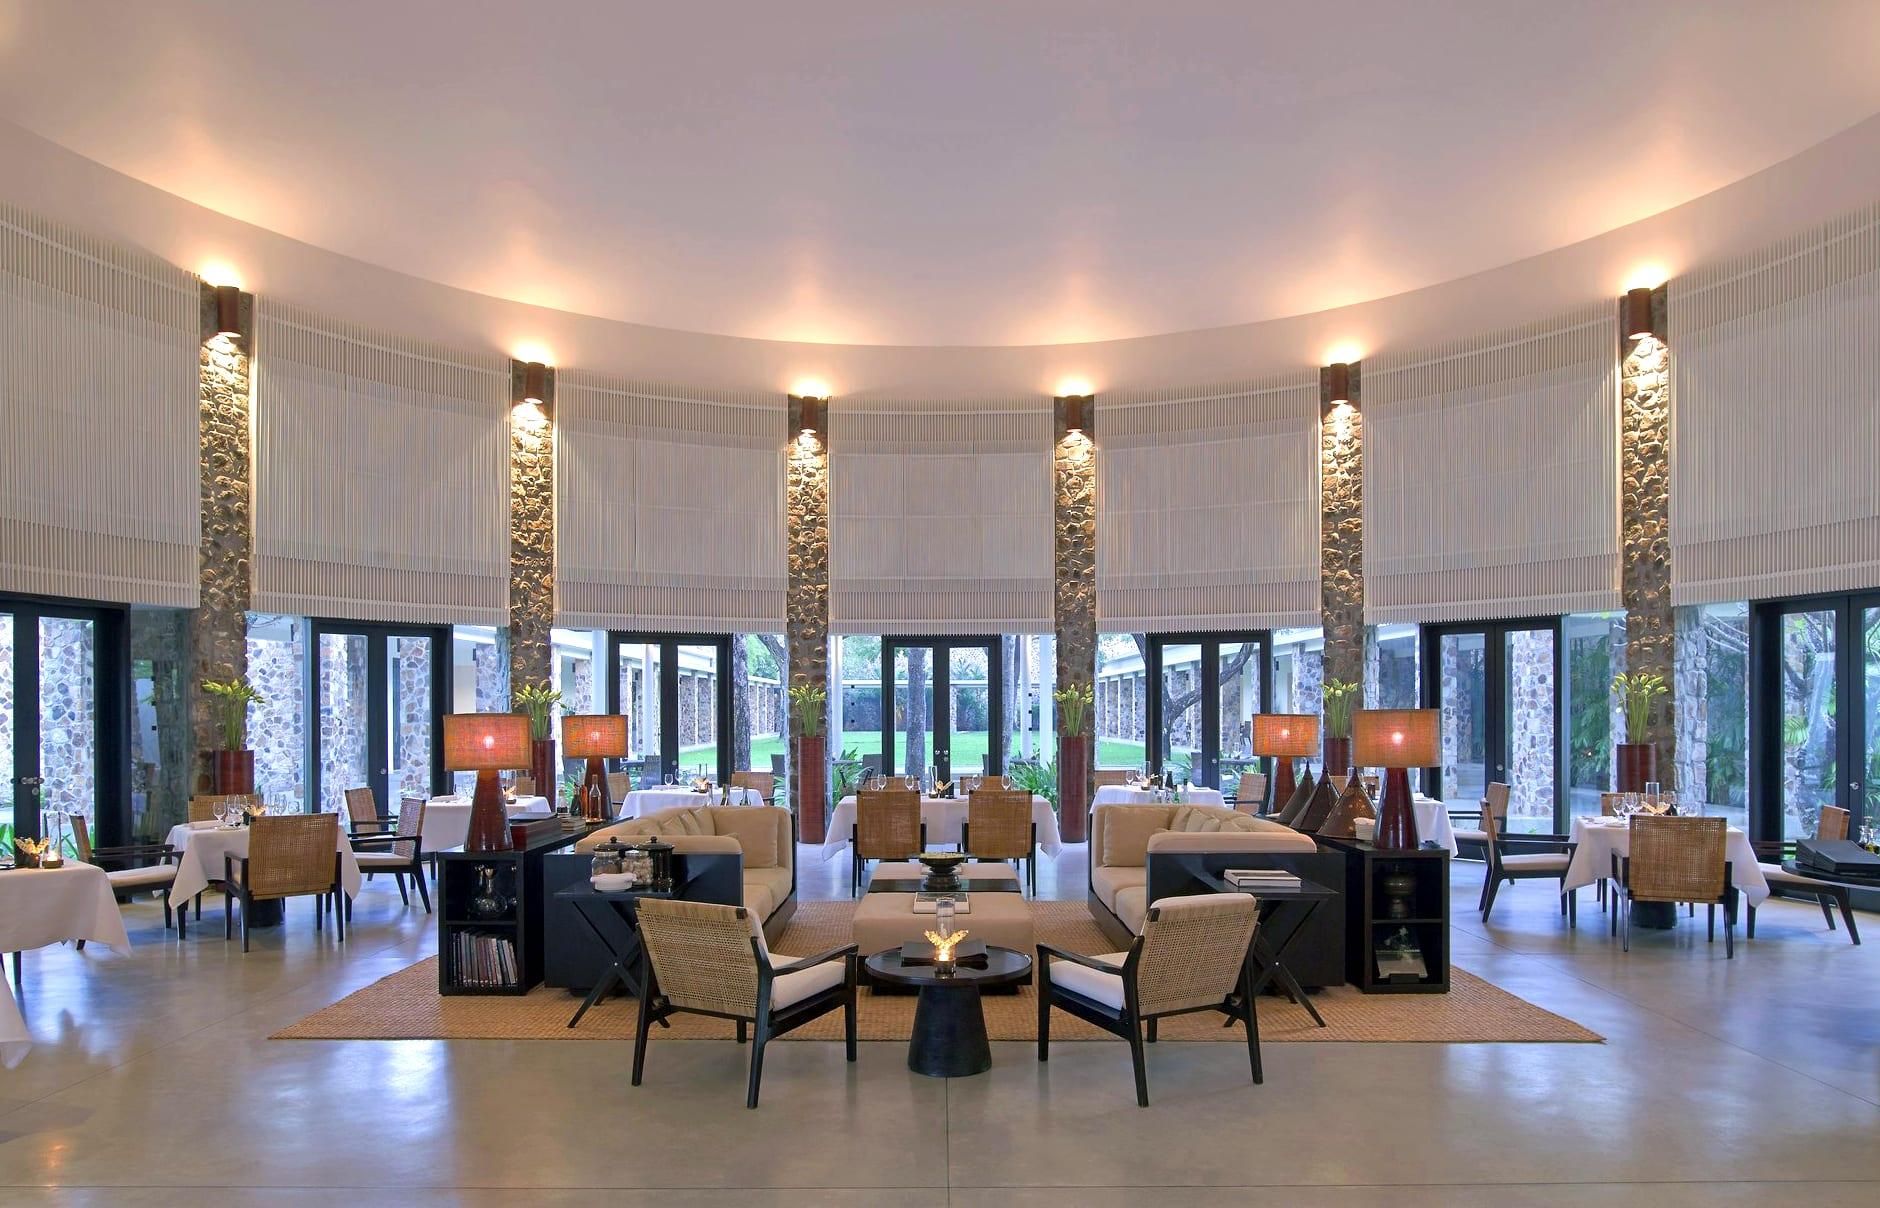 Amansara - Dining Room. © Amanresorts